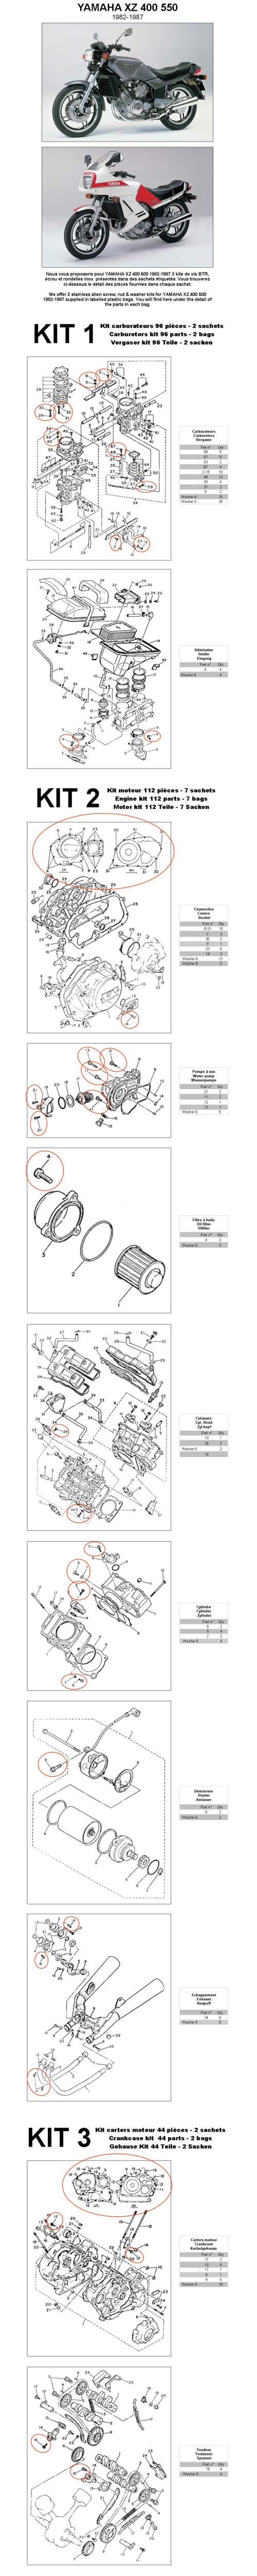 small resolution of yamaha xz 550 wiring diagram